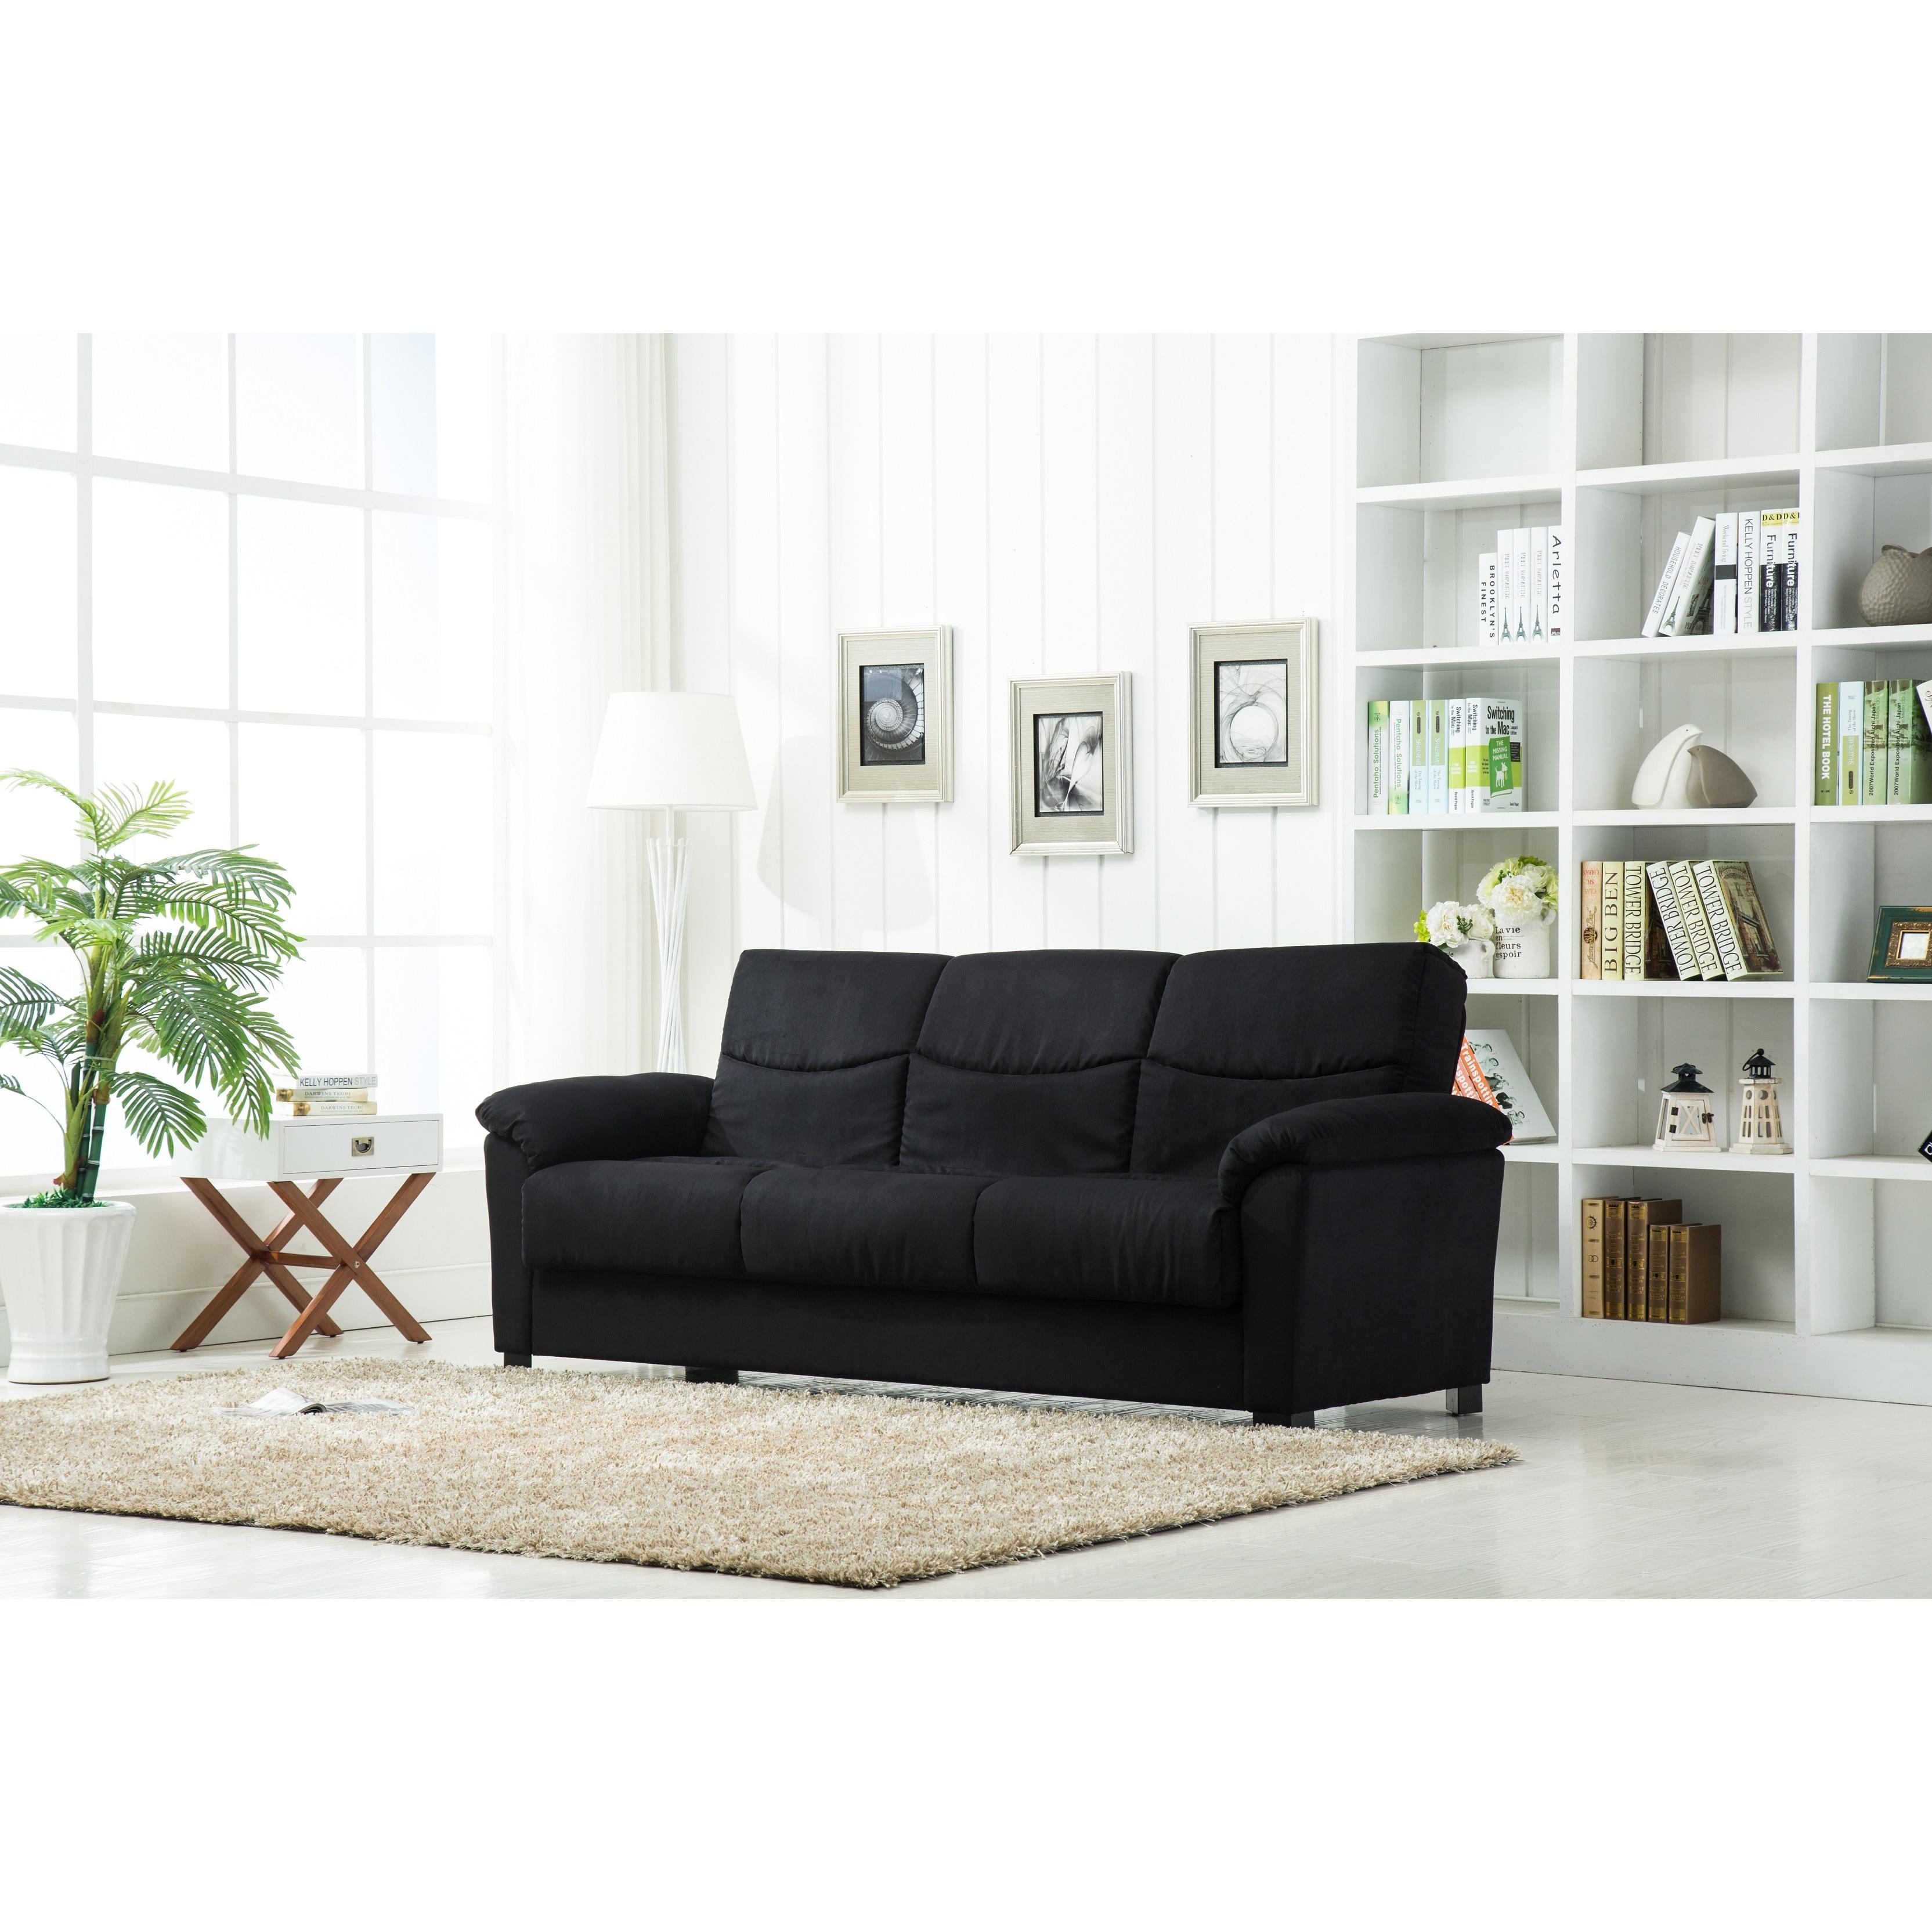 Urban Fabric Storage Sofa Bed (Tan), Size Full (Microfiber)